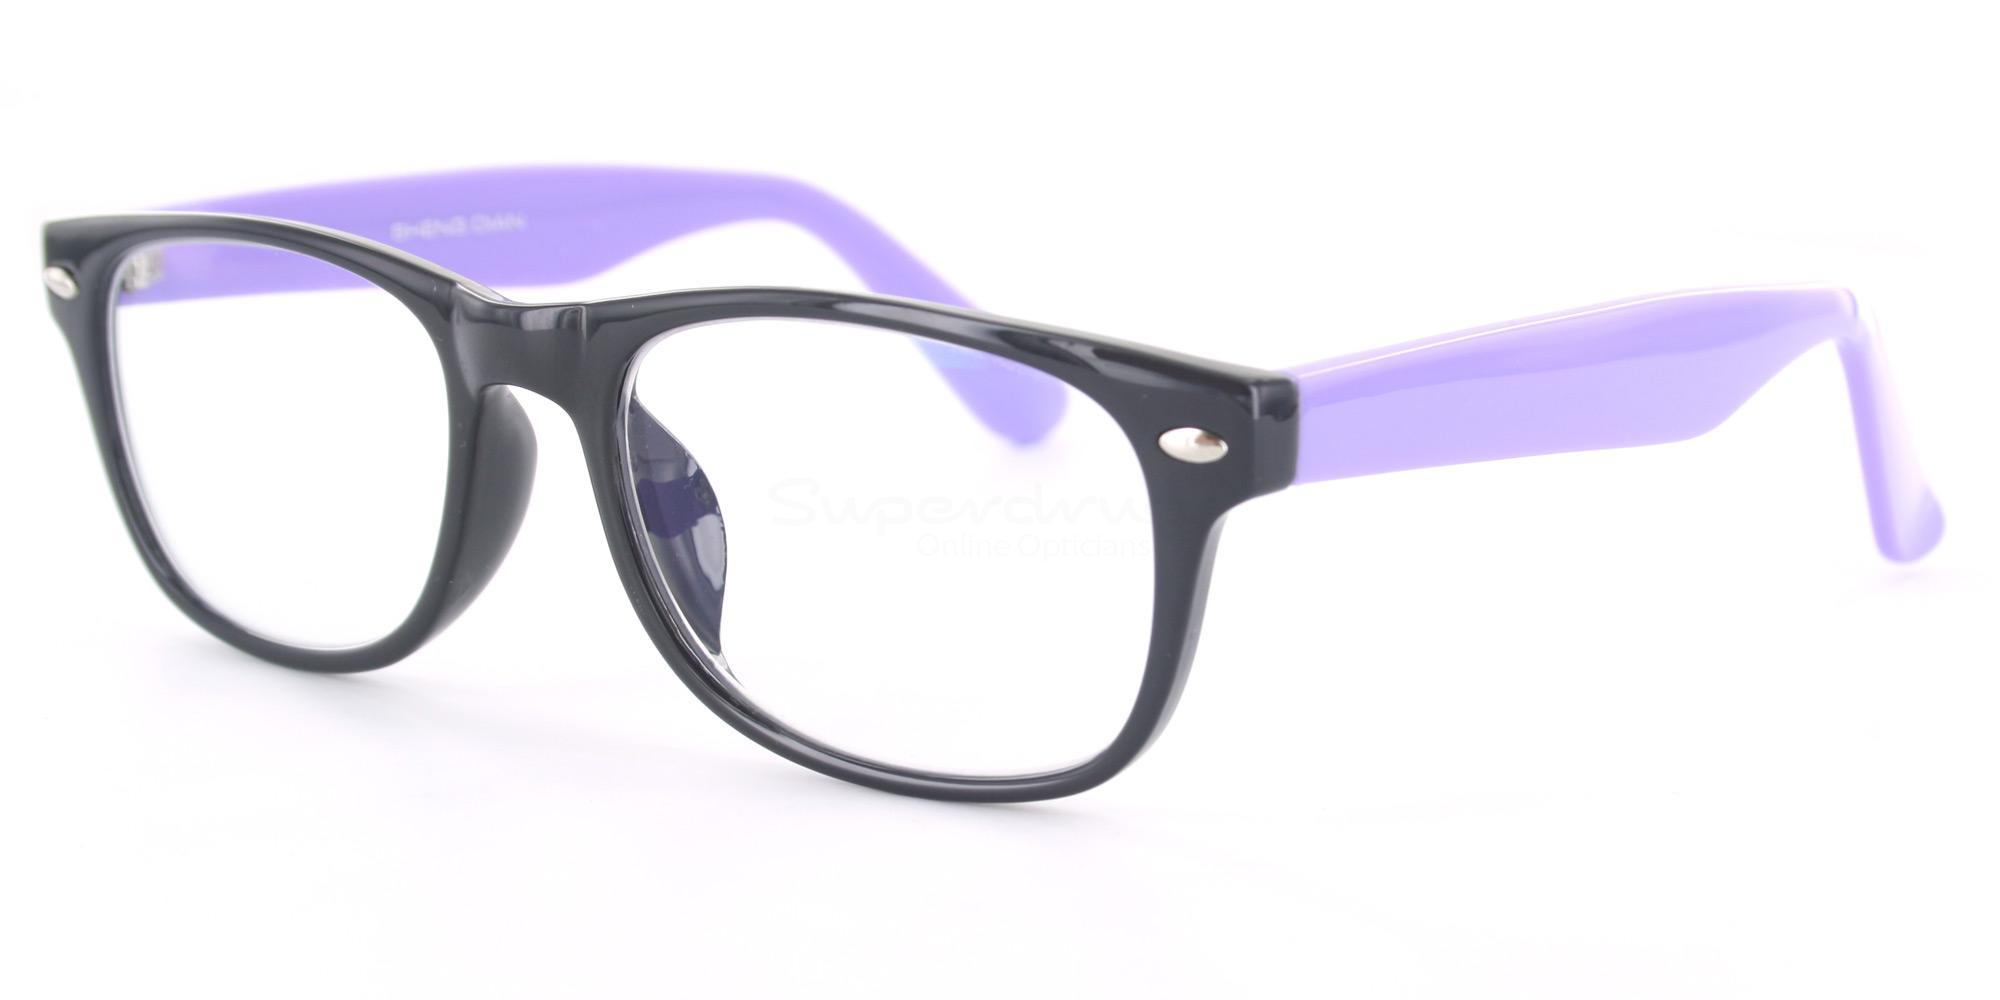 C90 P2383 - Black and Purple , Helium